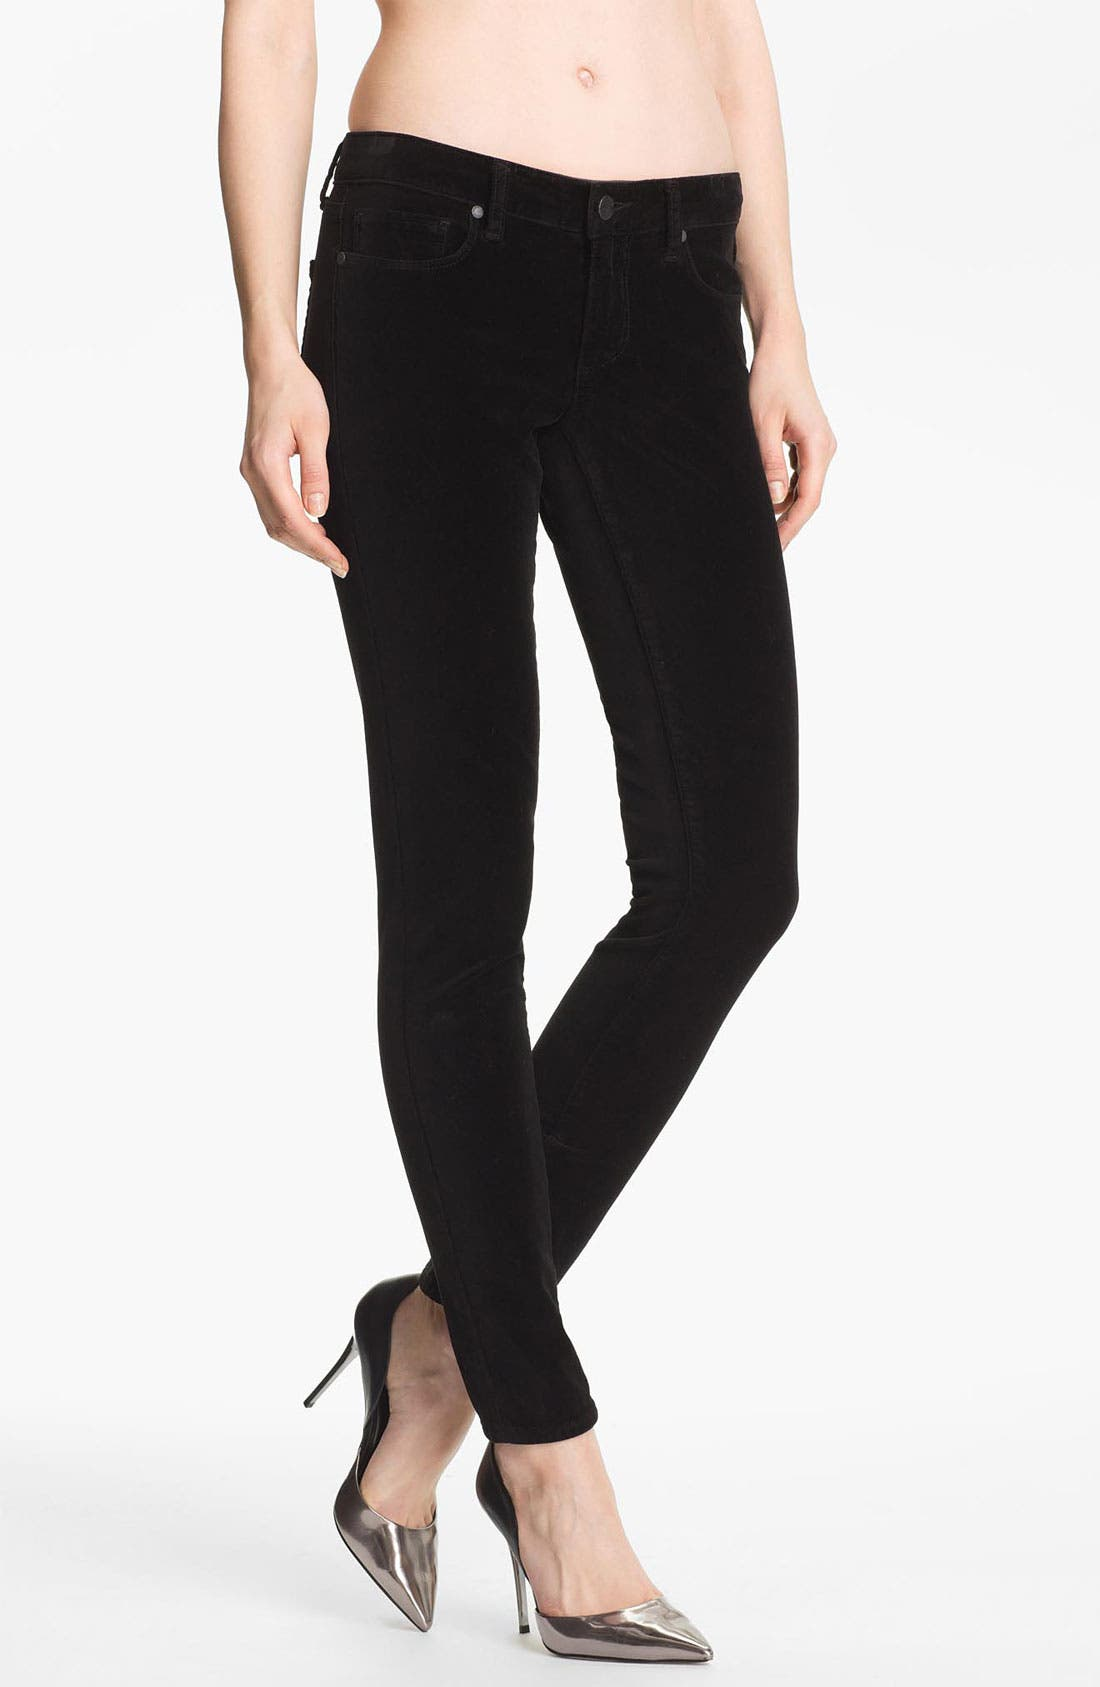 Alternate Image 1 Selected - Paige Denim 'Verdugo' Stretch Velvet Skinny Pants (Black)